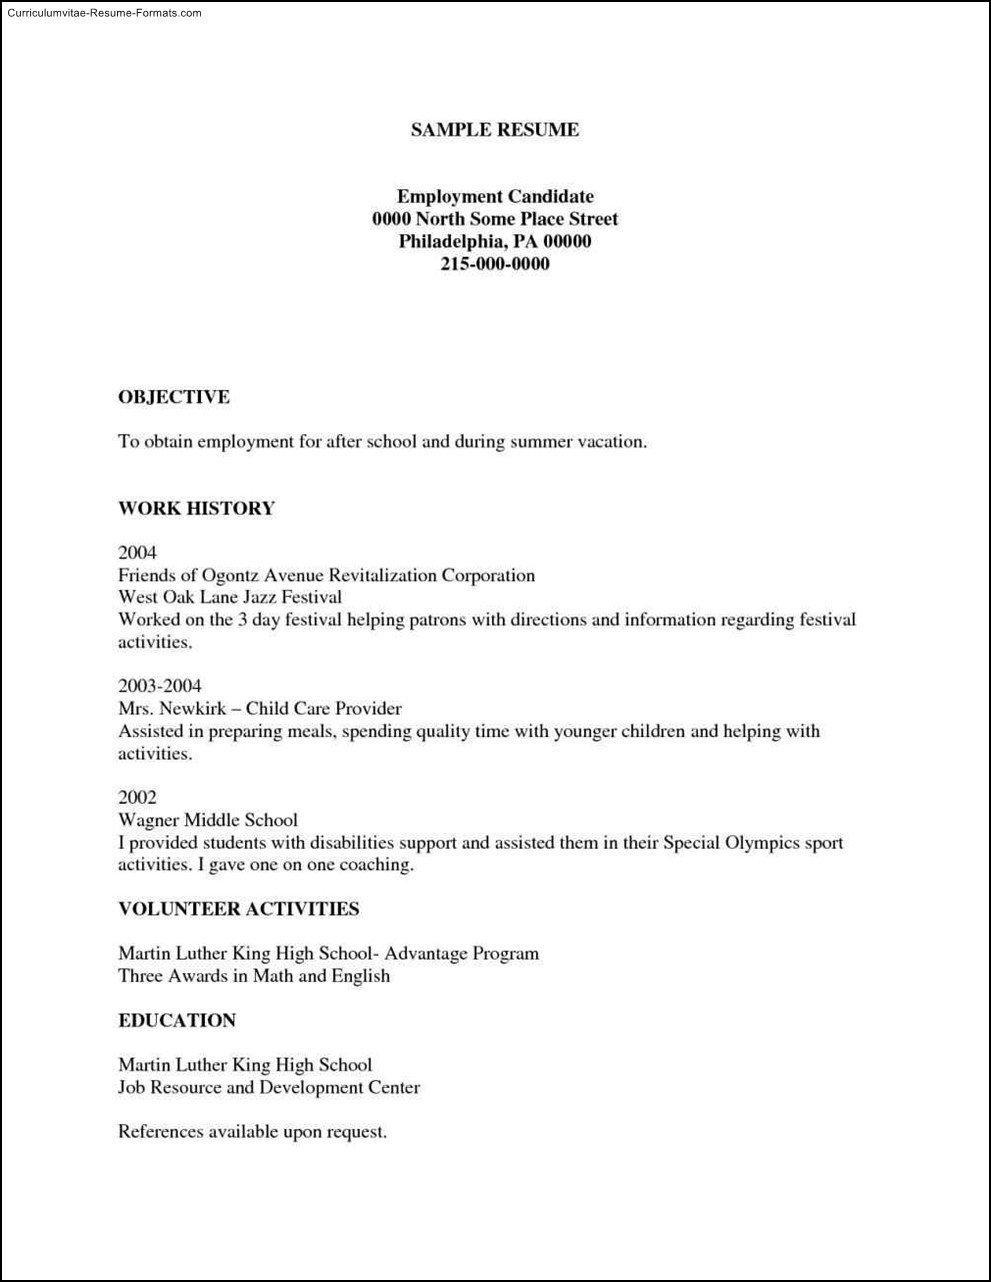 Resume Templates Free Printable Free Printable Resumes Templates